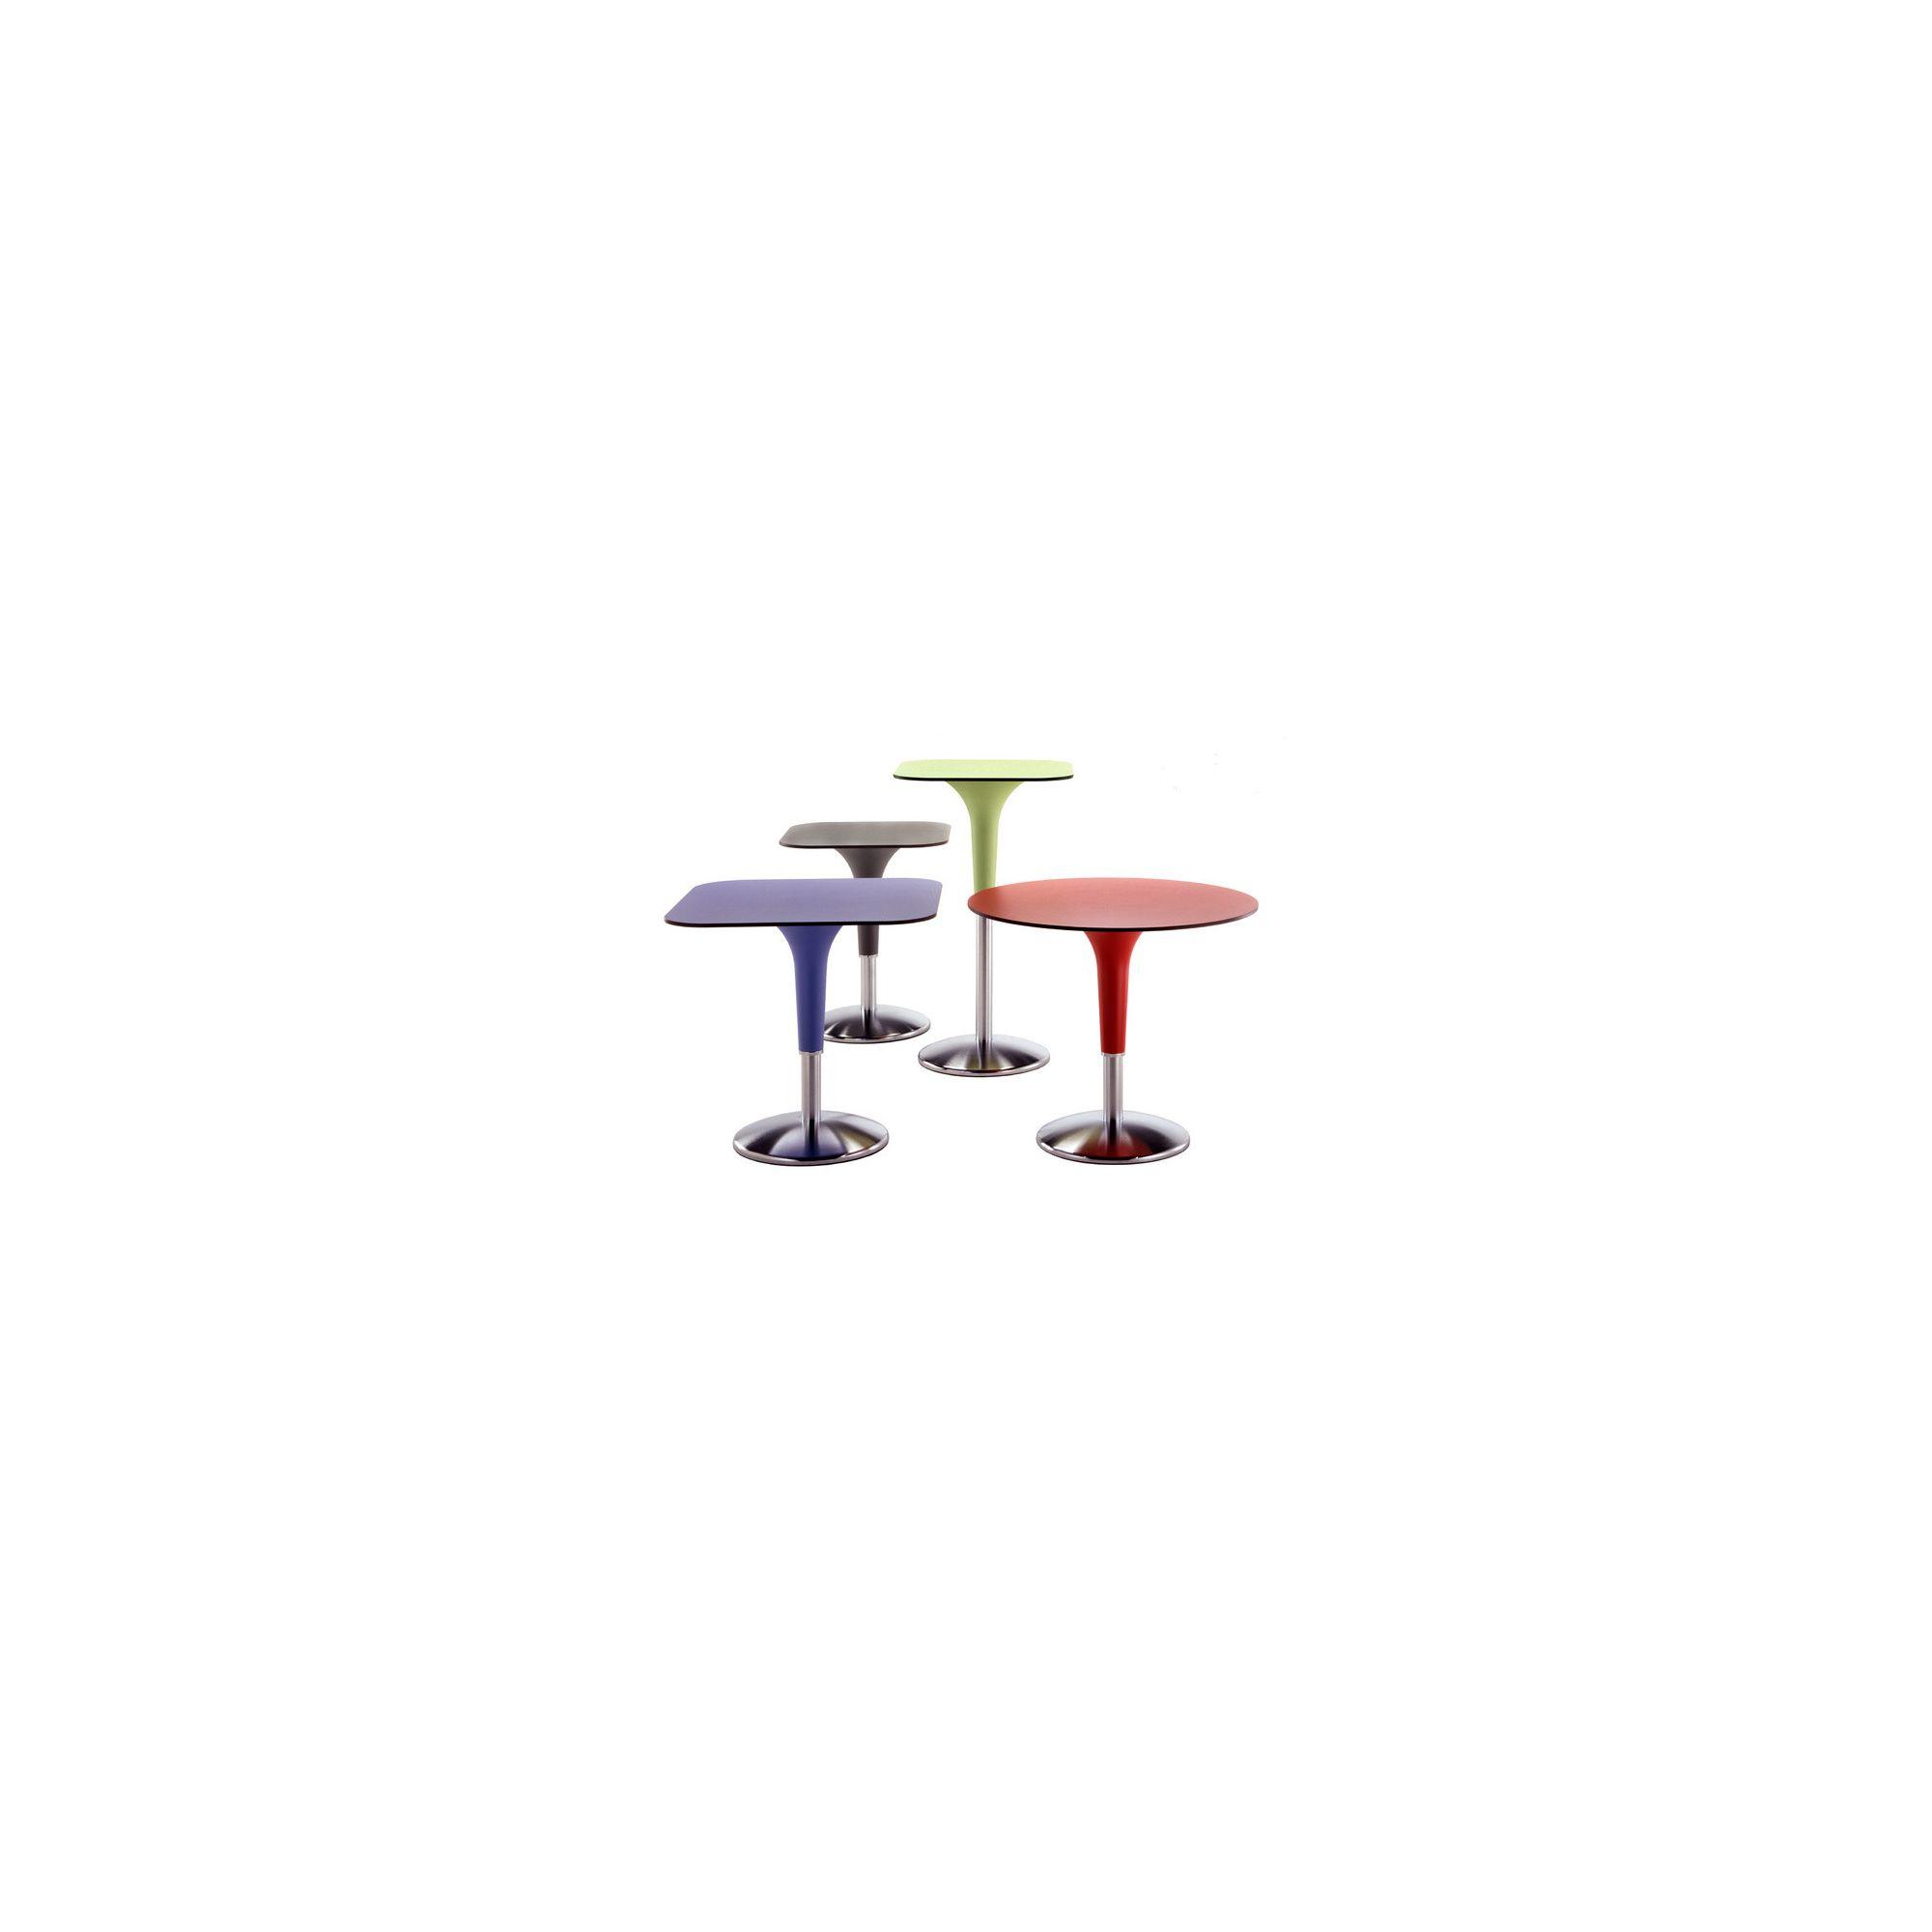 Rexite Zanziplano Round Table - 90cm x 105cm - Grey at Tesco Direct